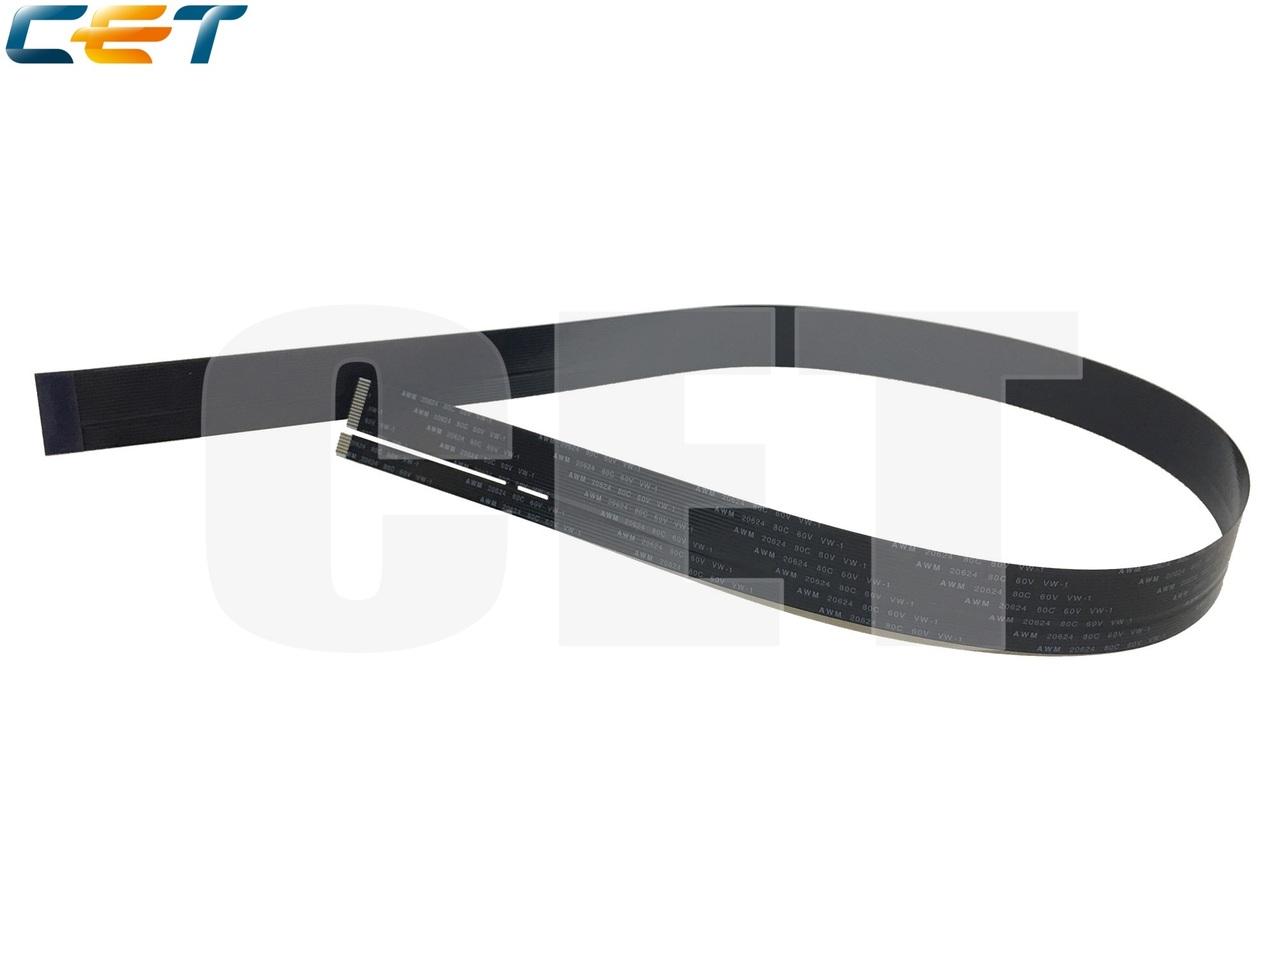 Шлейф каретки сканера 14+6 pins FFK-M1536 для HP LaserJetM1536 (CET), CLS0307